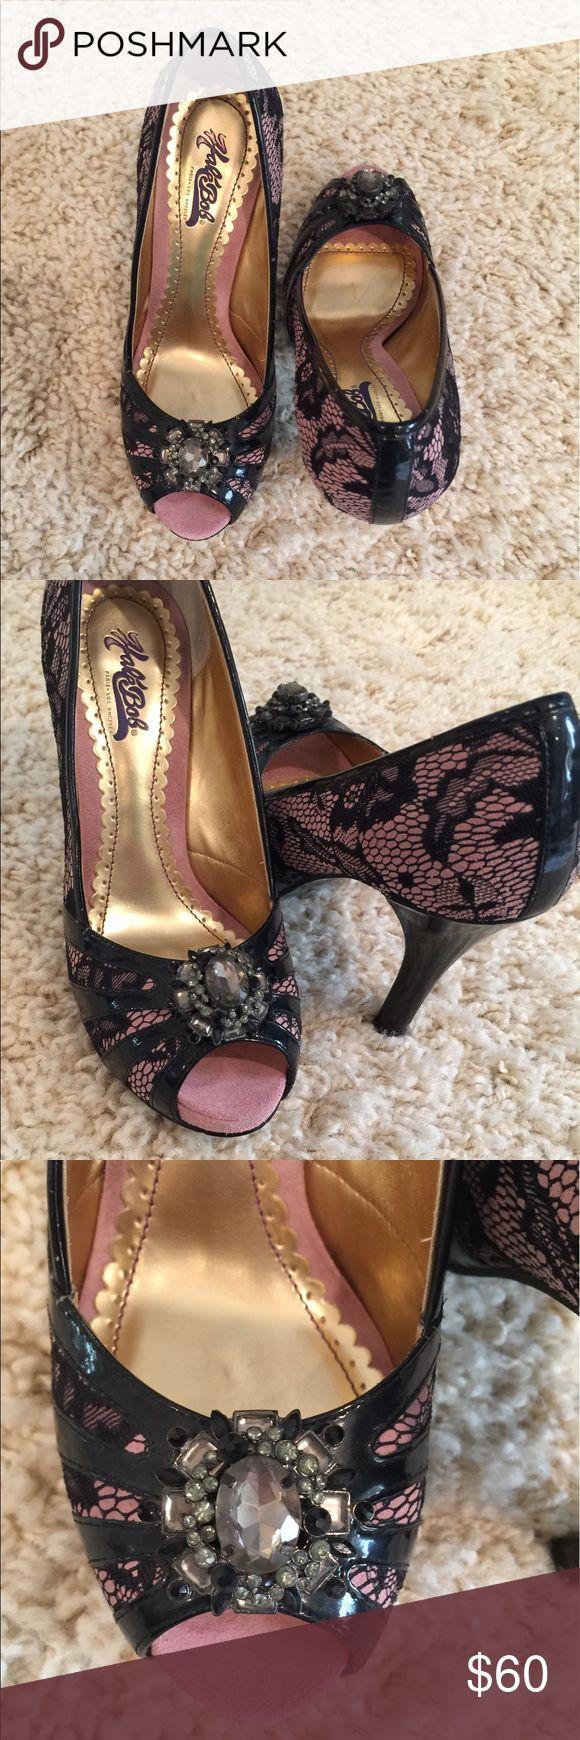 "SALE Pink & black lace platform heels with jewels! SO CUTE! .5"" platform. 4"" heel. Great condition! Worn twice! Hale Bob Shoes Platforms"